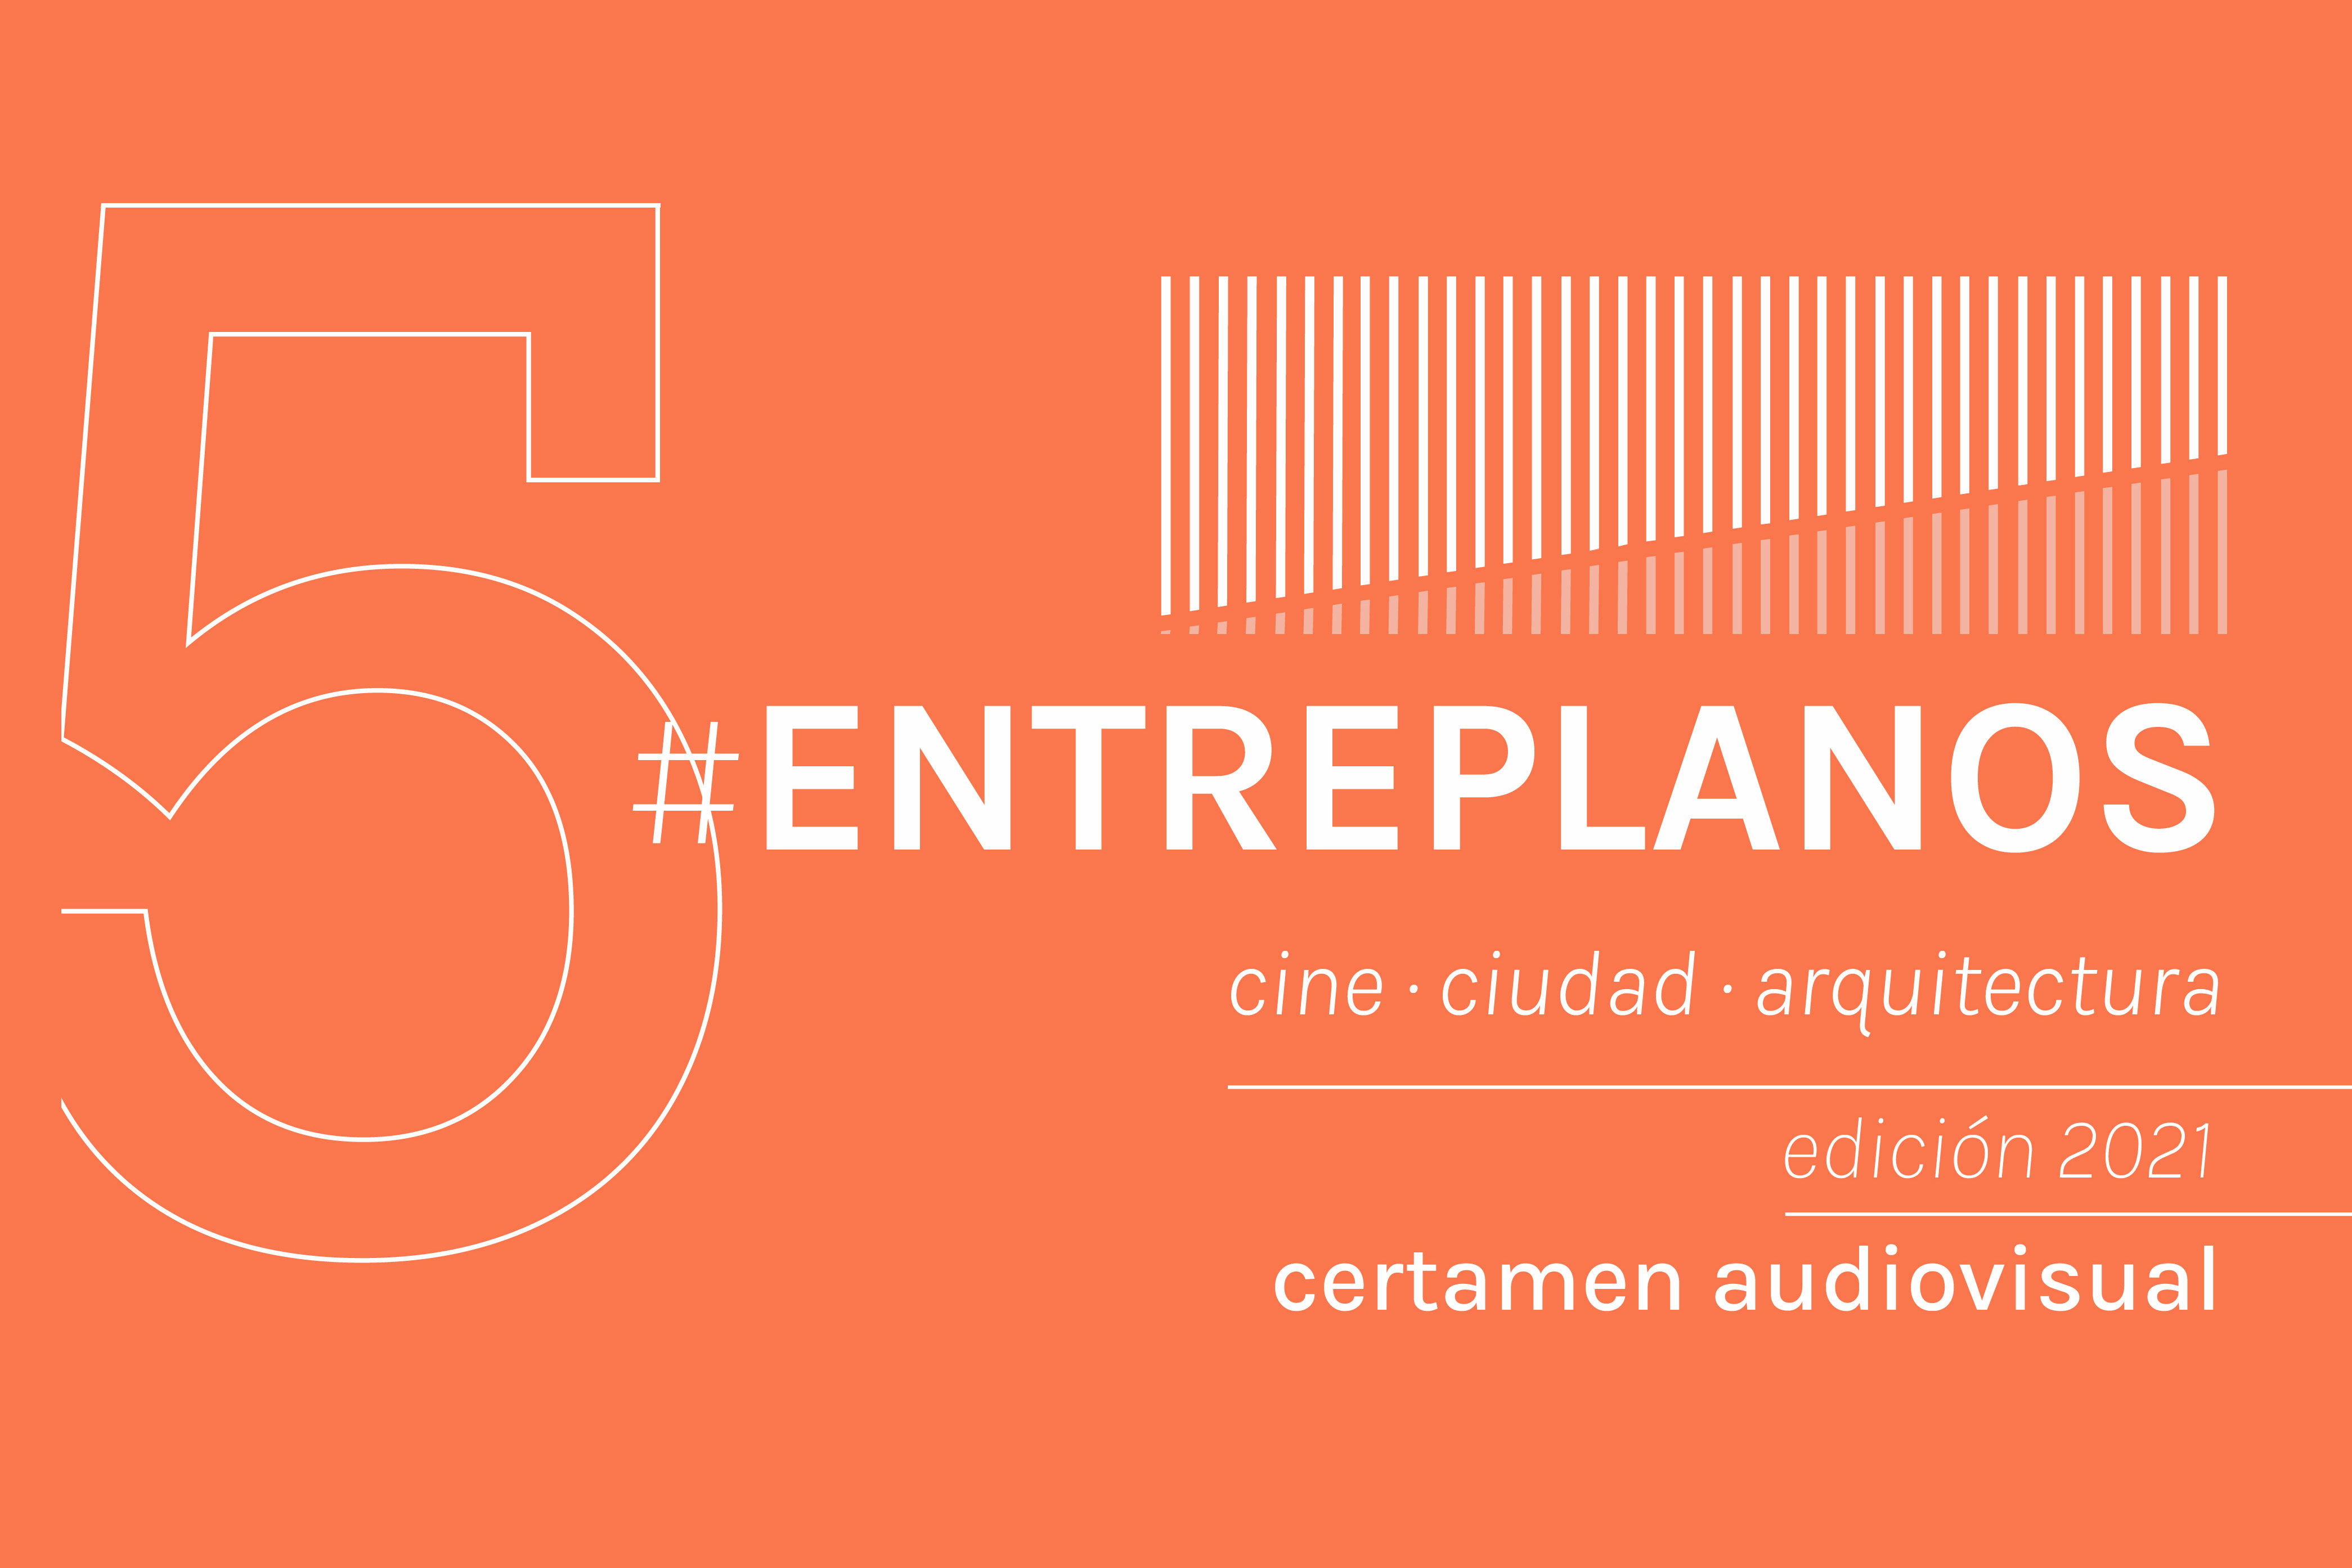 ENTREPLANOS 5. cine. ciudad. arquitectura